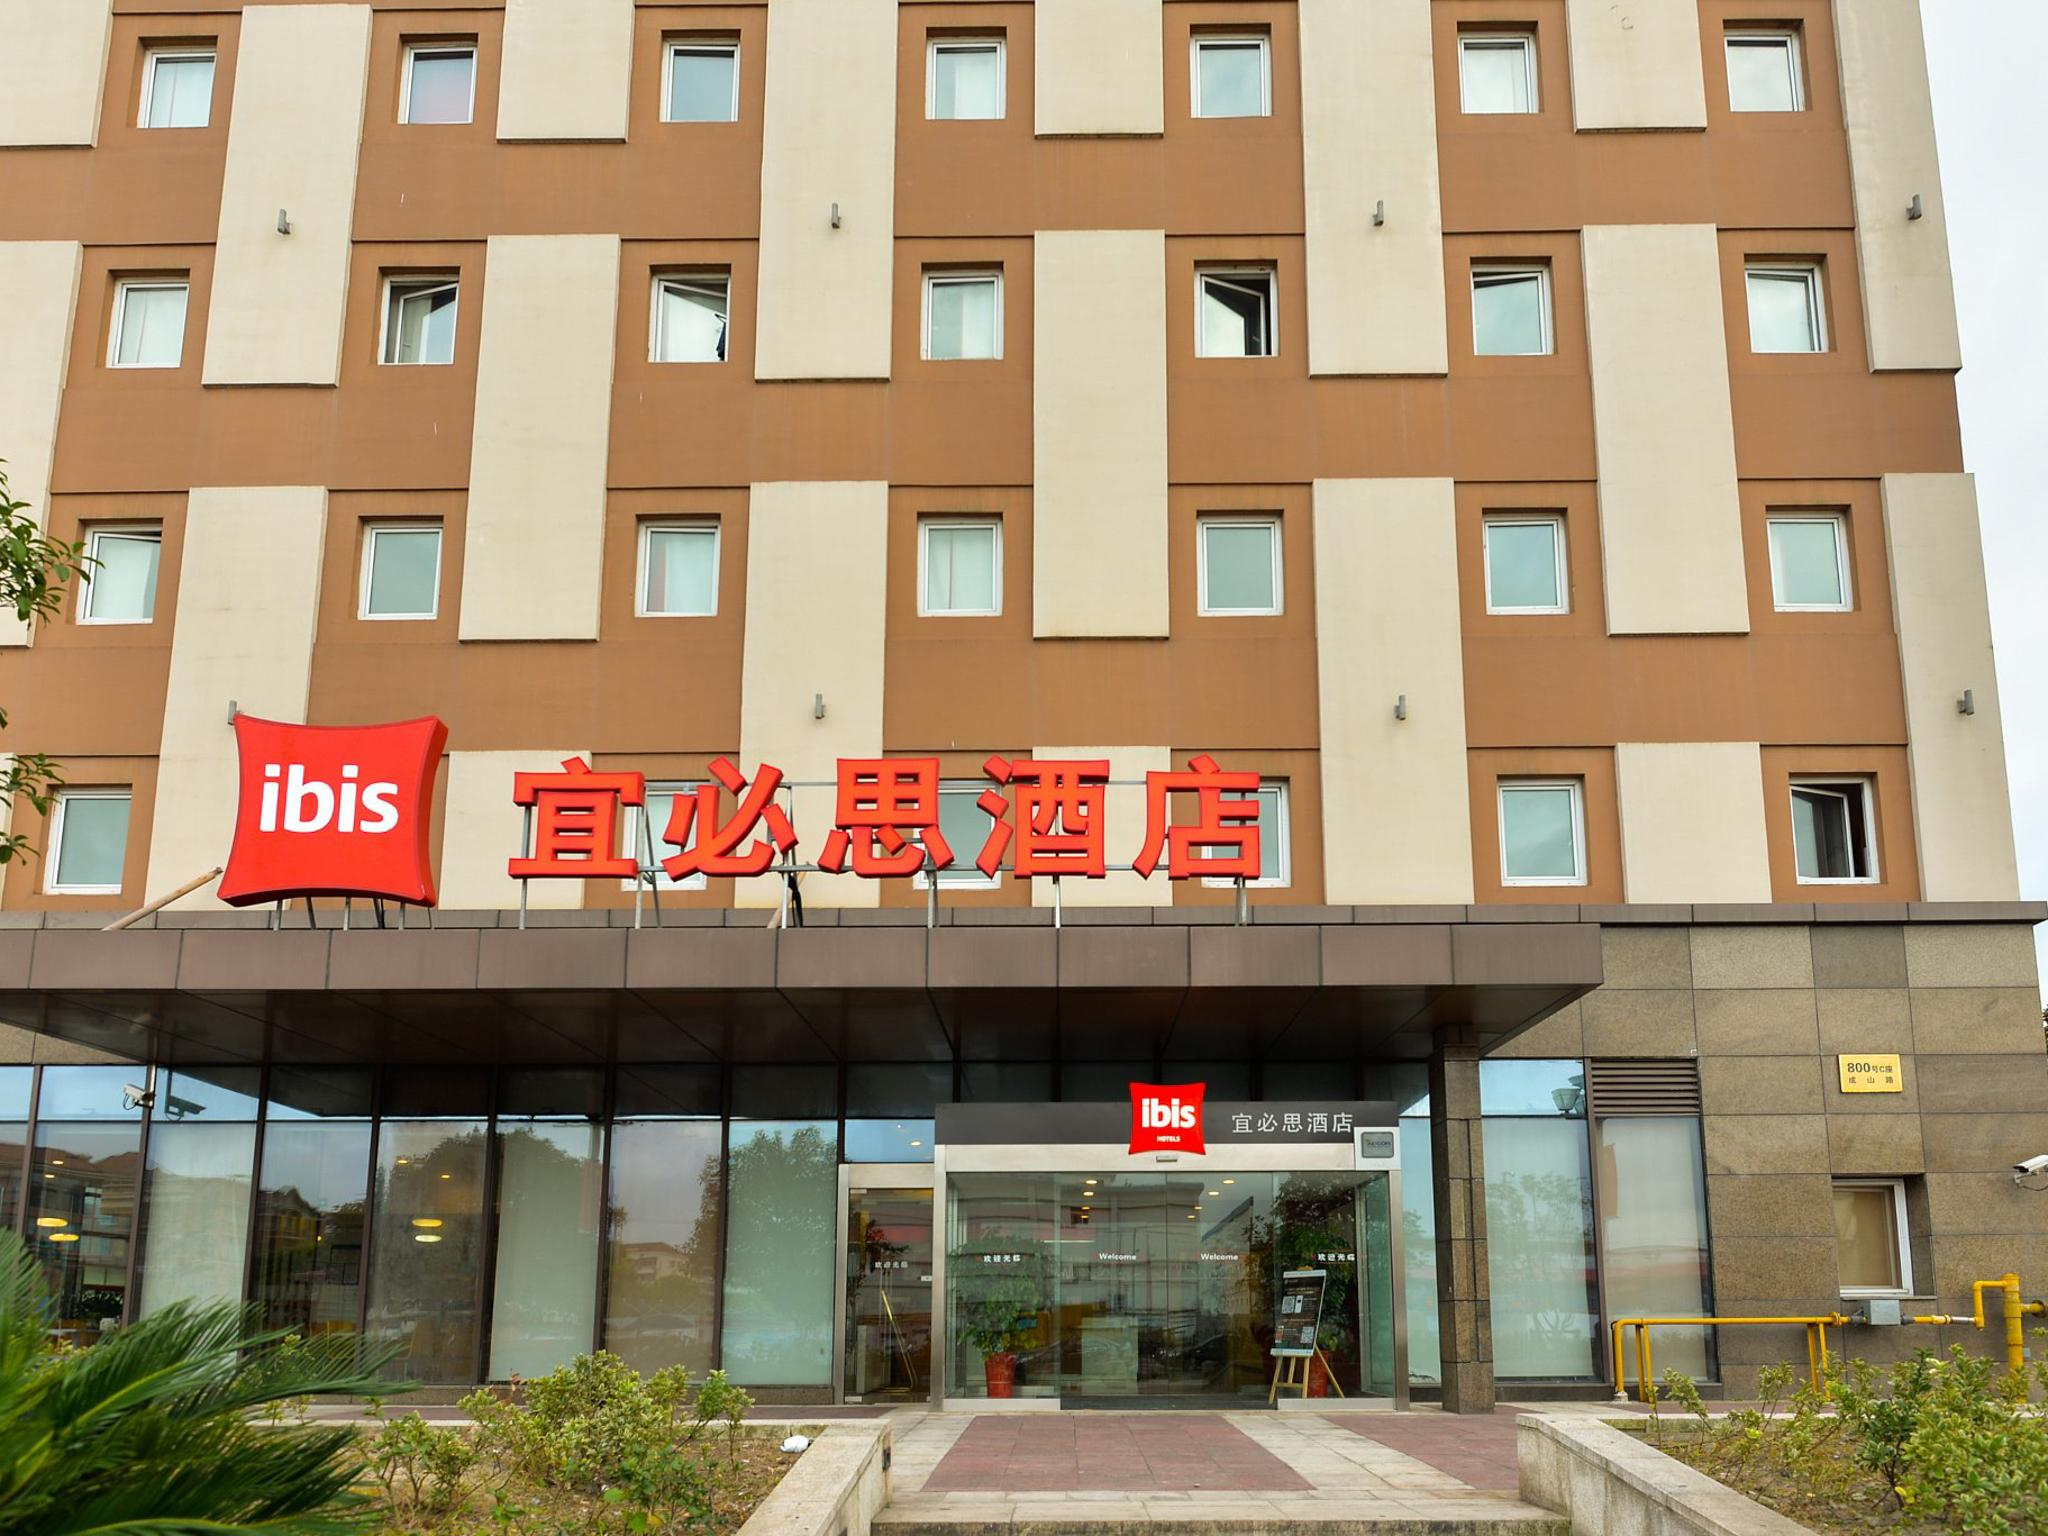 Ibis Shanghai Expo Hotel